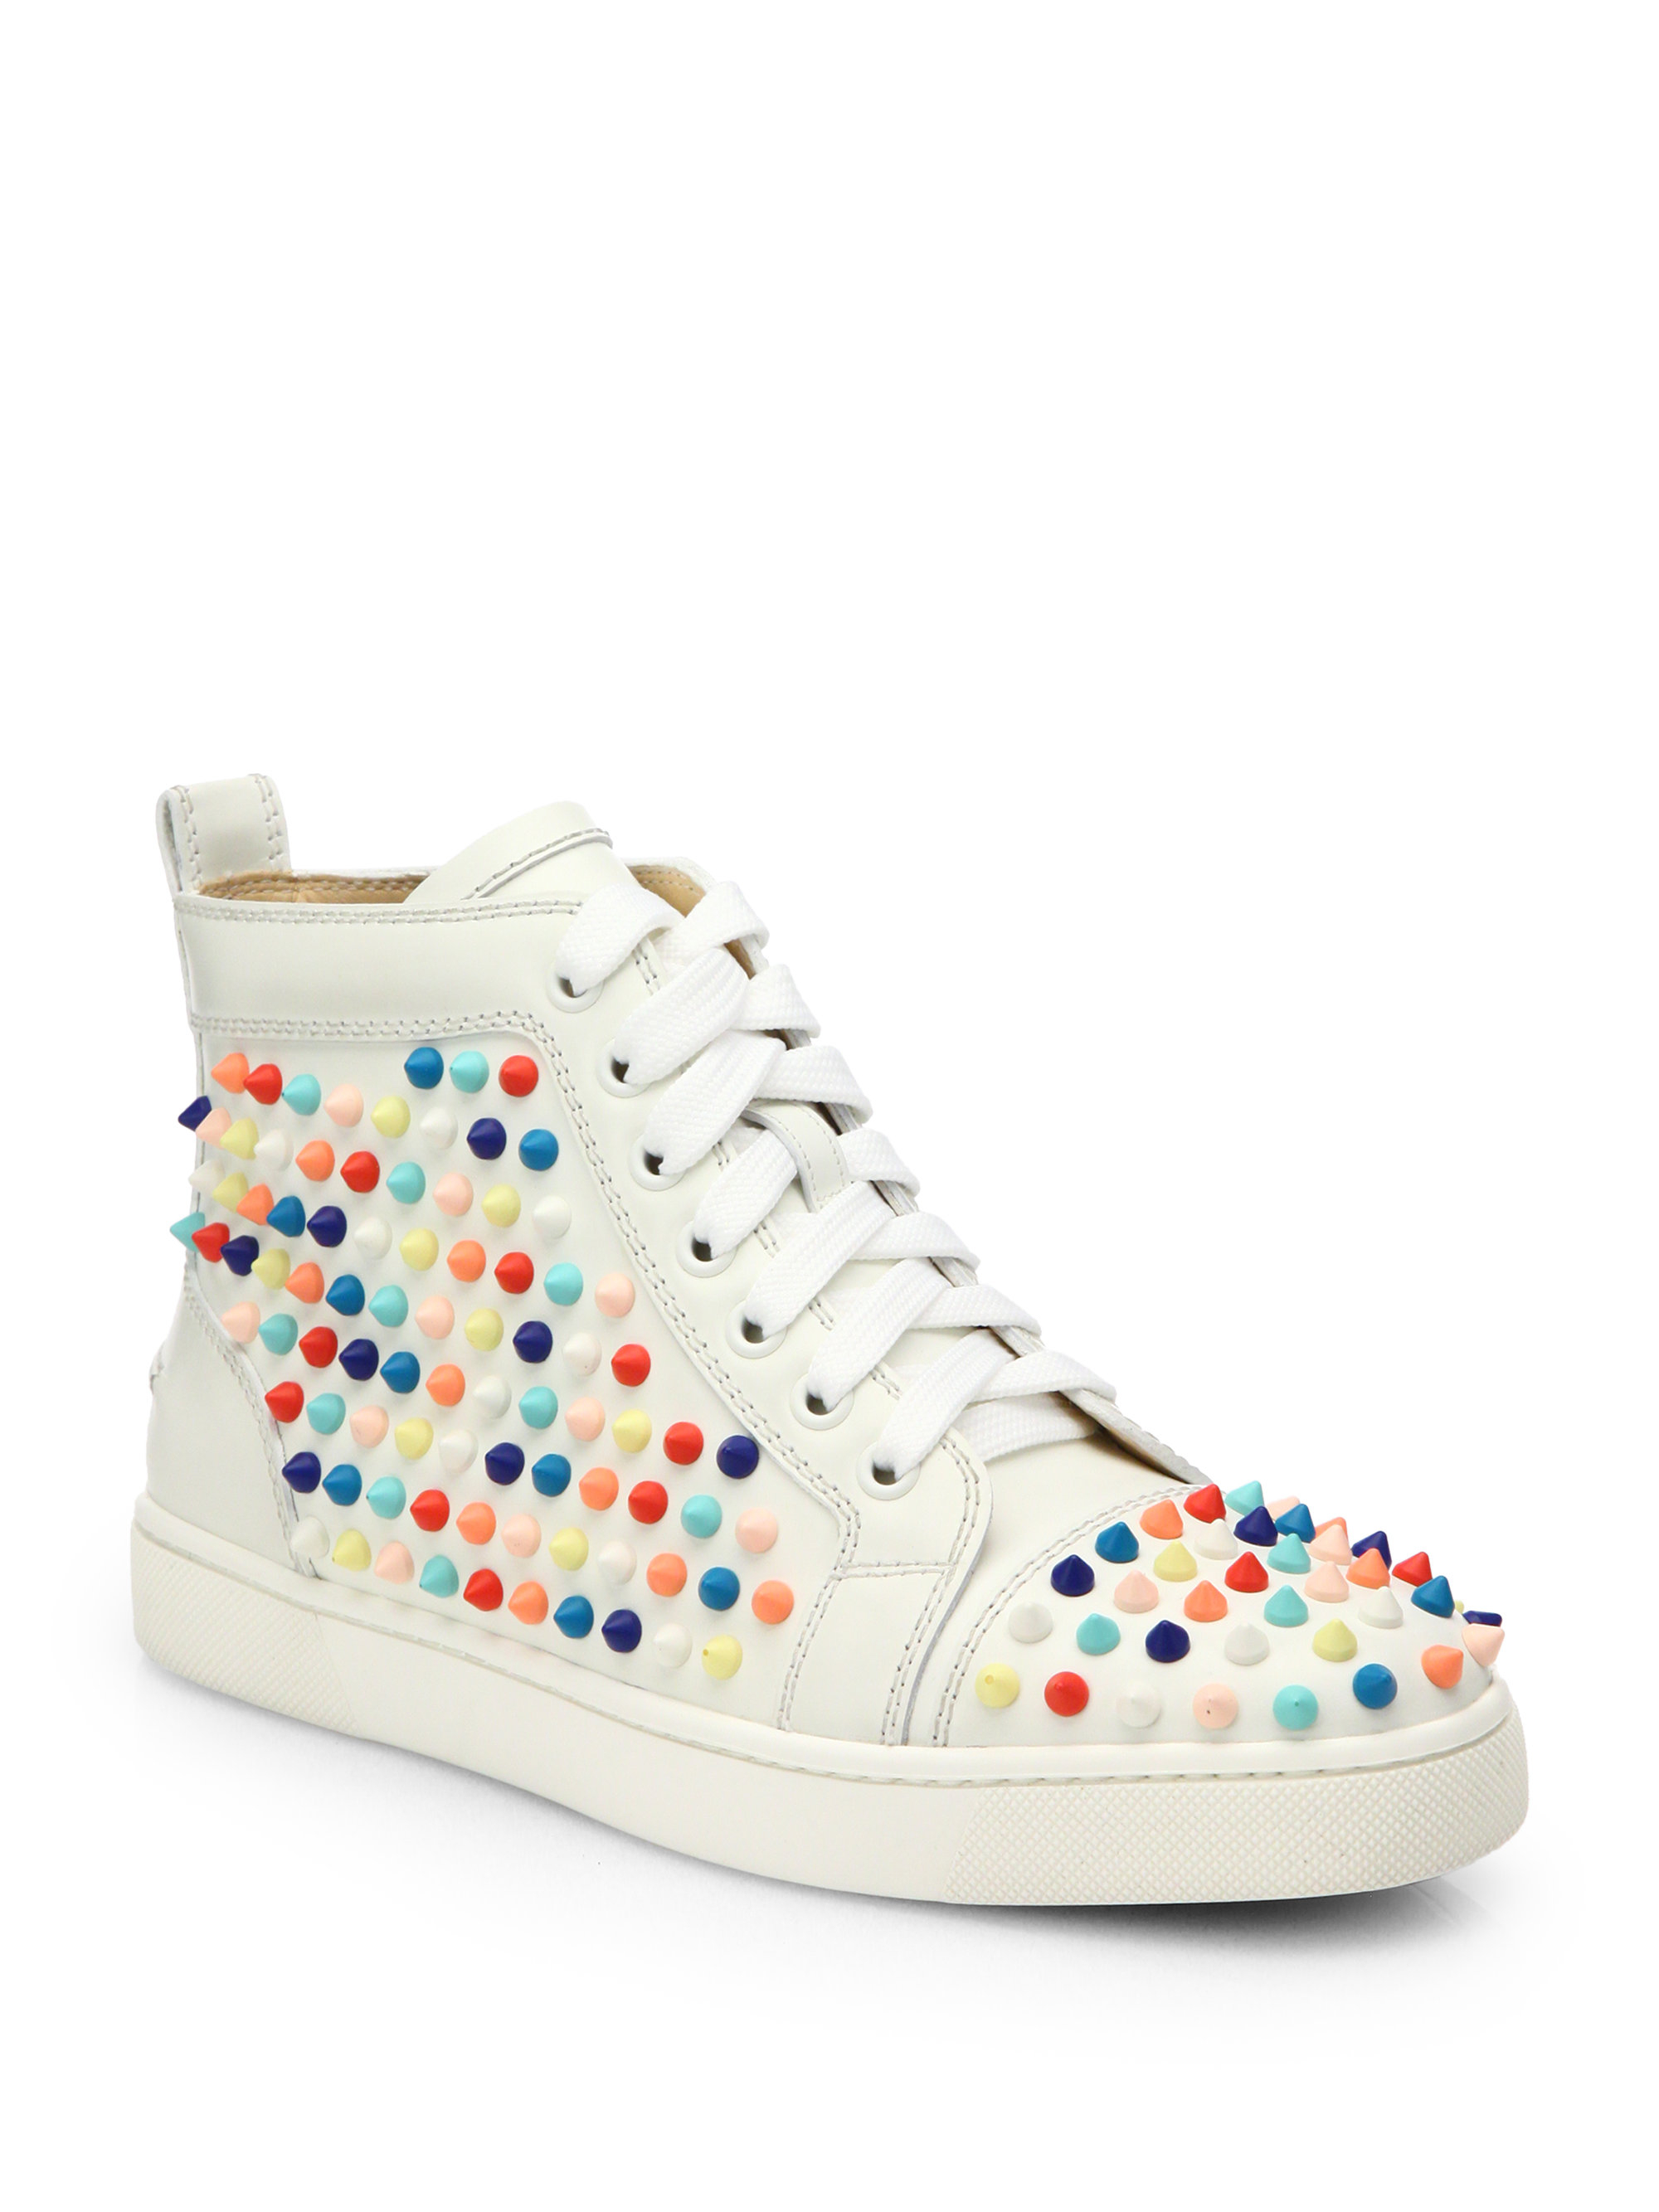 16f1ea59ea1 Christian Louboutin White Louis Woman Studded Leather Wedge Sneakers